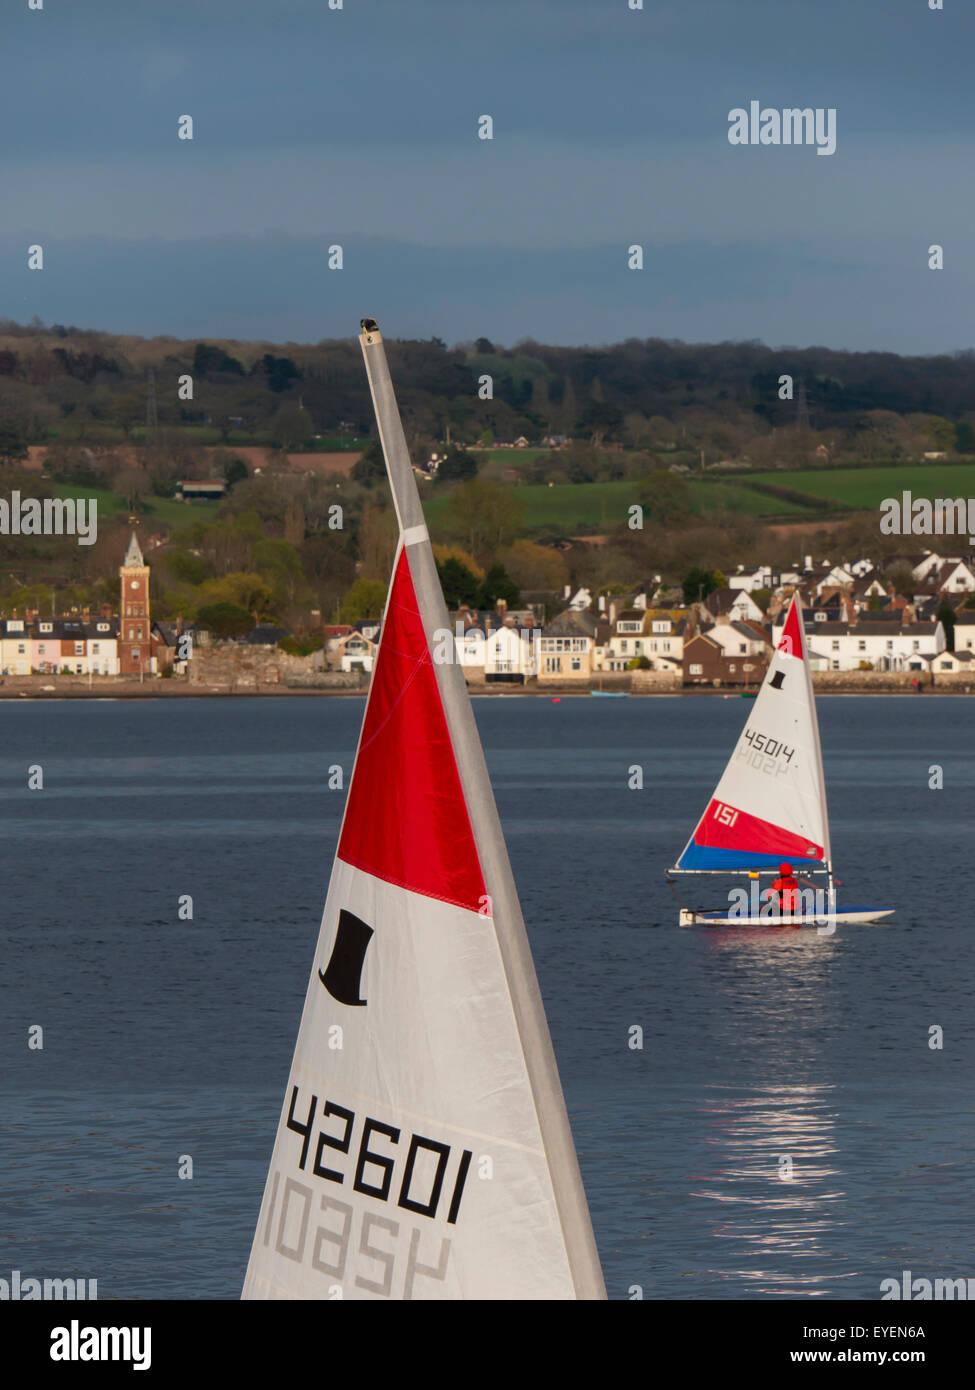 Exe estuary sailing; Lympstone, Devon, England - Stock Image